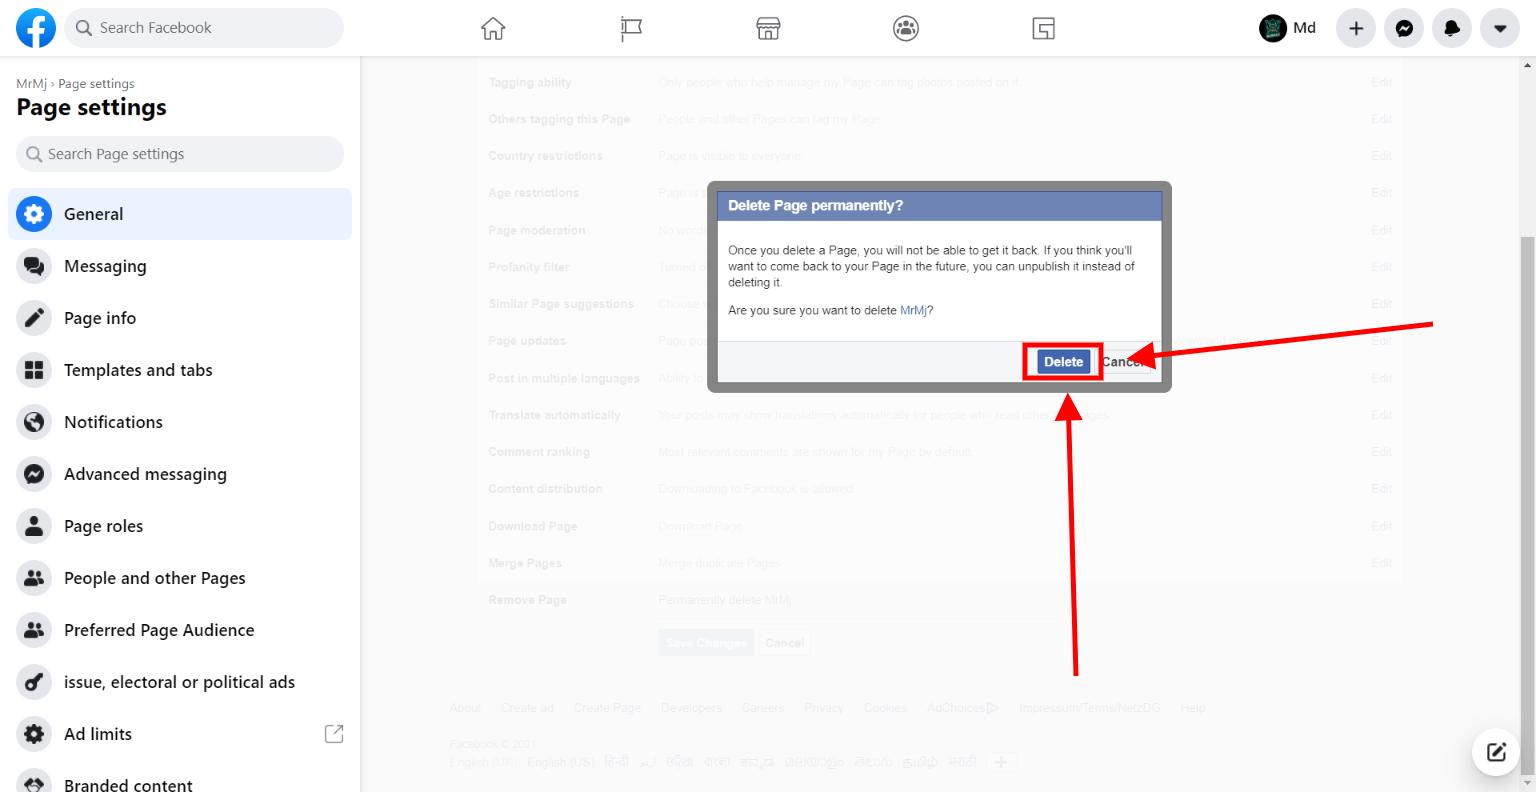 screenshot www.facebook.com 2021.03.09 12 41 16